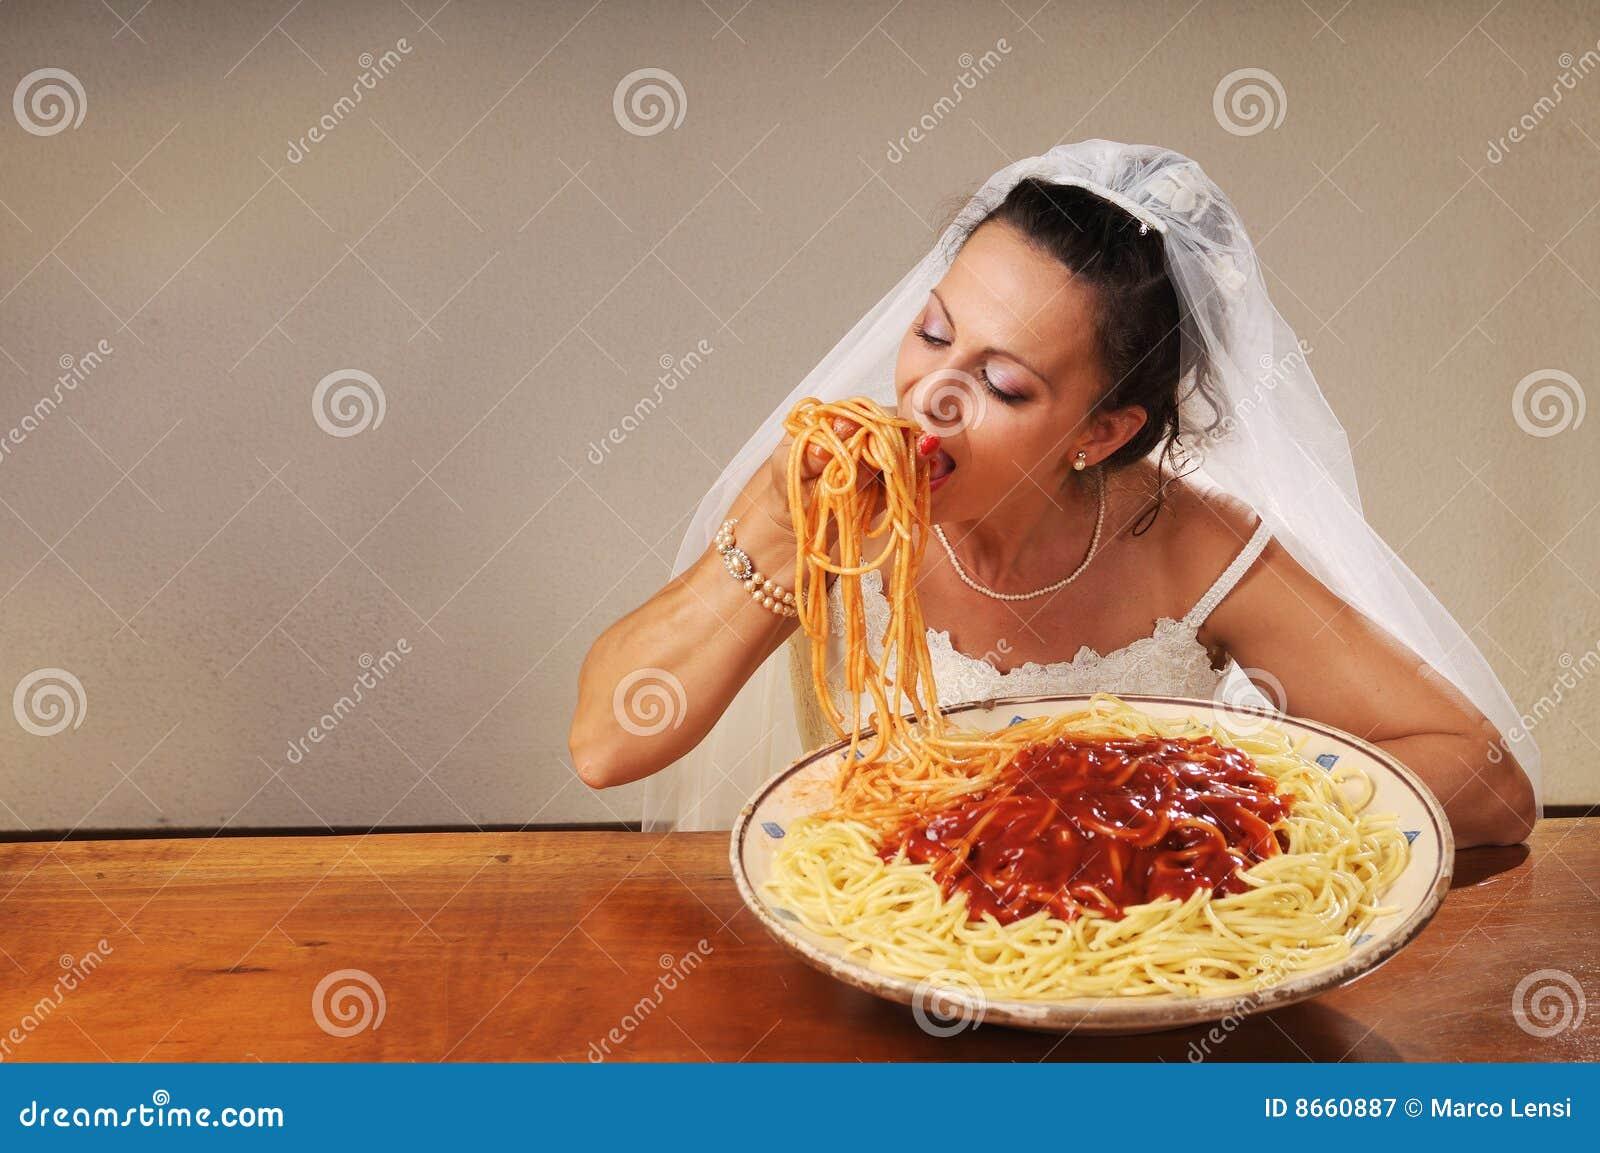 La mariée mange des spaghetti